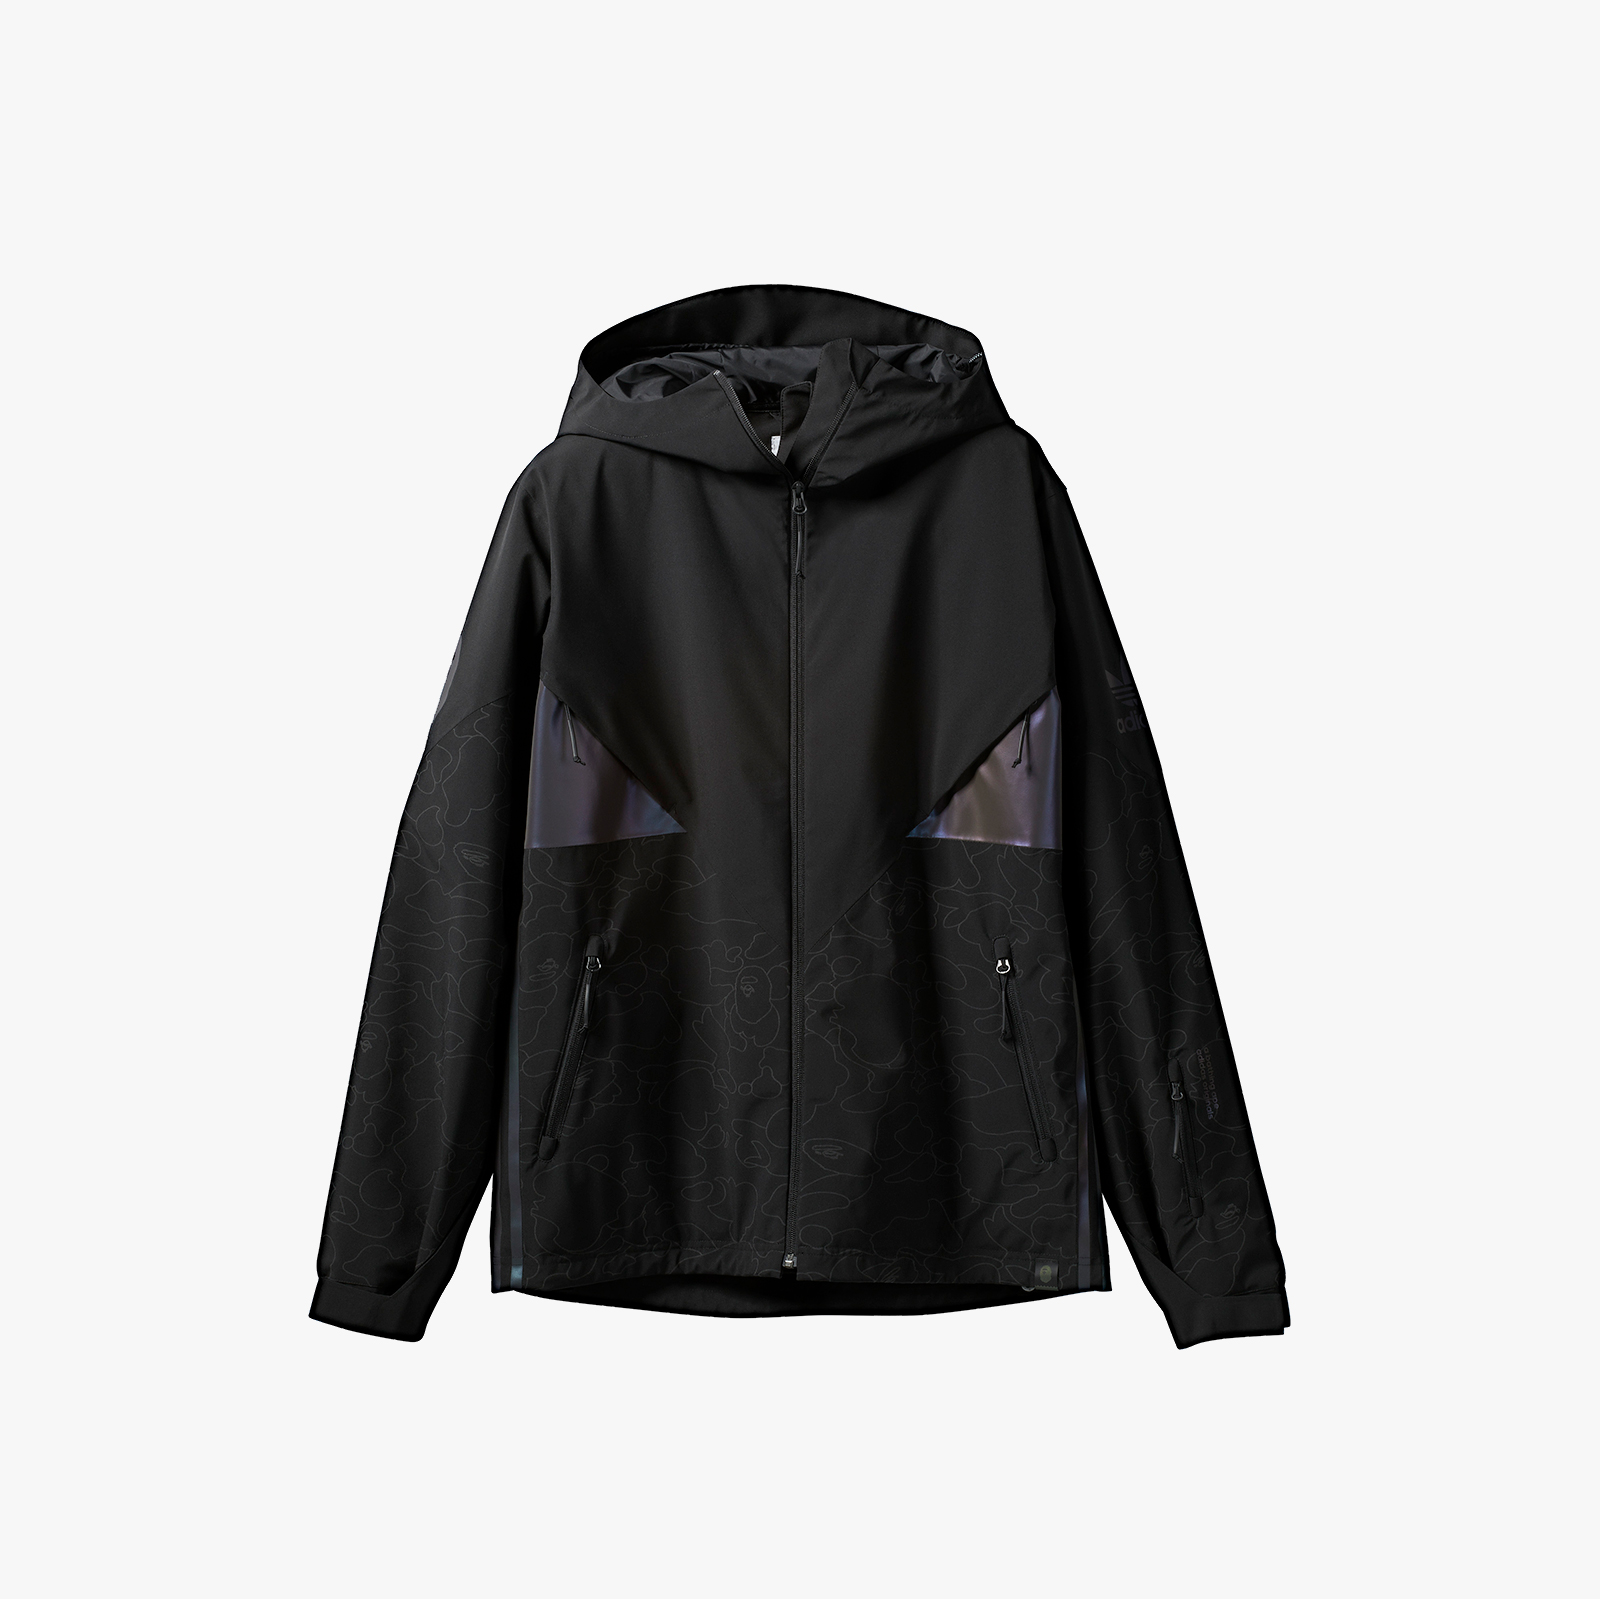 Adidas Snow Jacket x BAPE Du0202 Sneakersnstuff